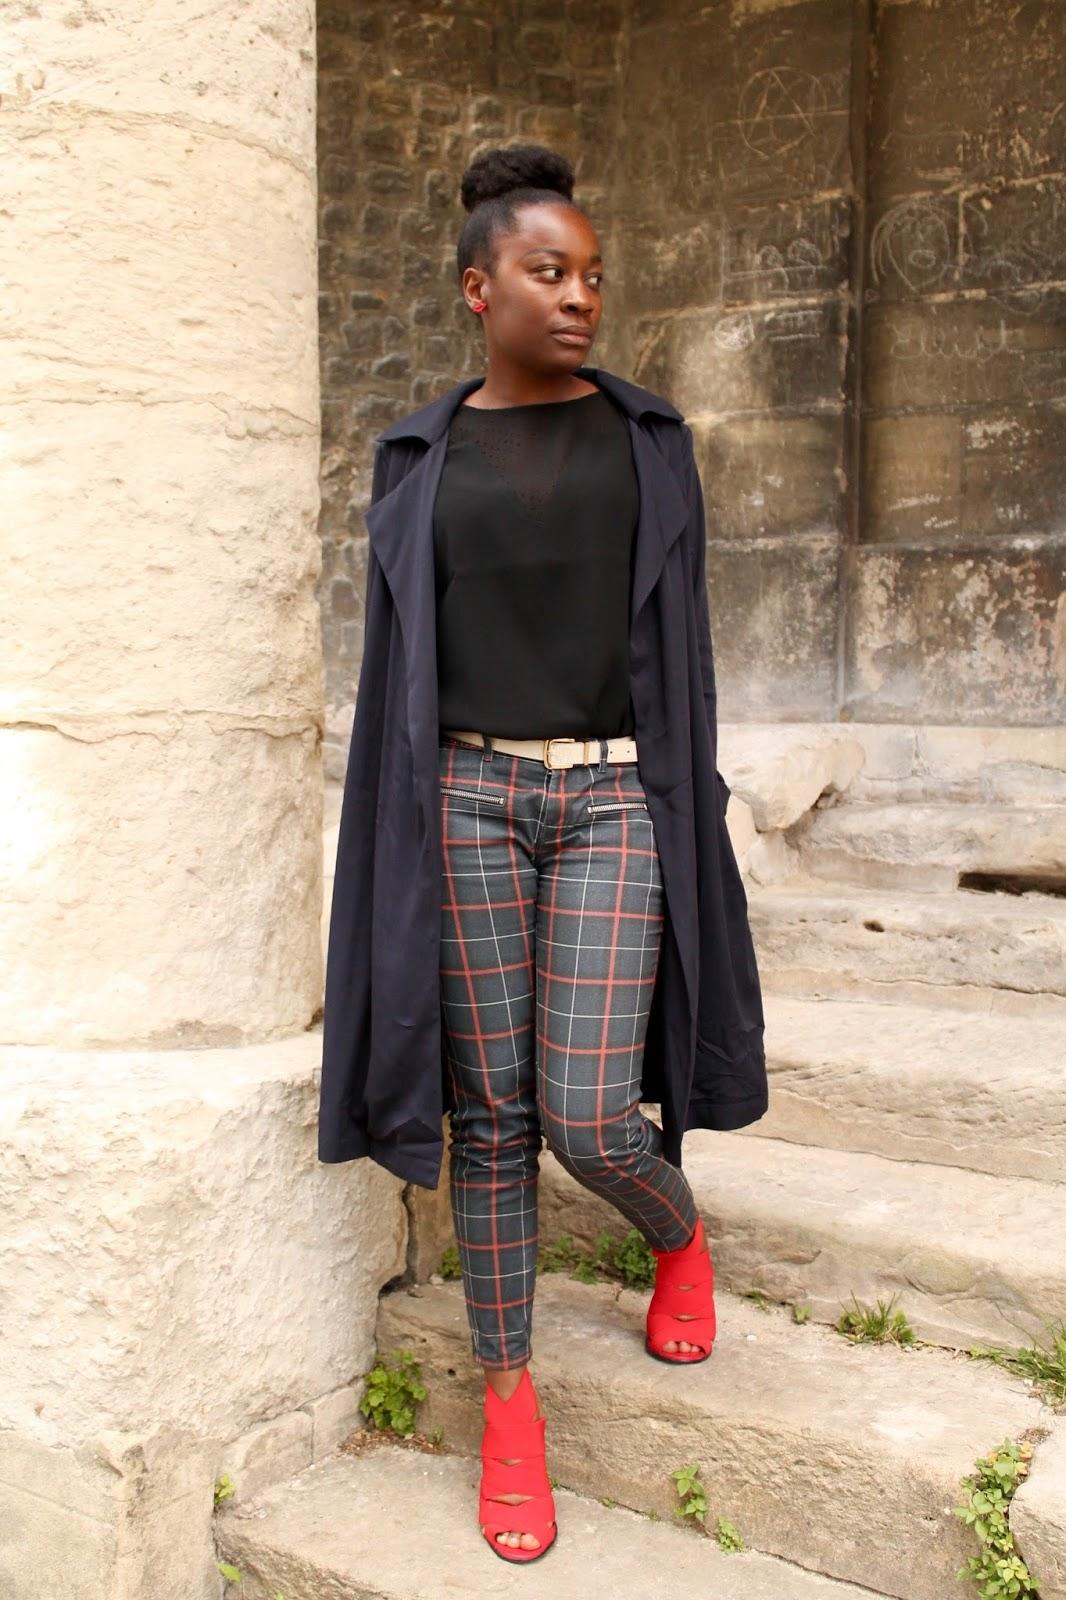 blogmode-lafillefauchee-hype-tendance-pantalonacarreau-chaussuresrouges-petitbudget